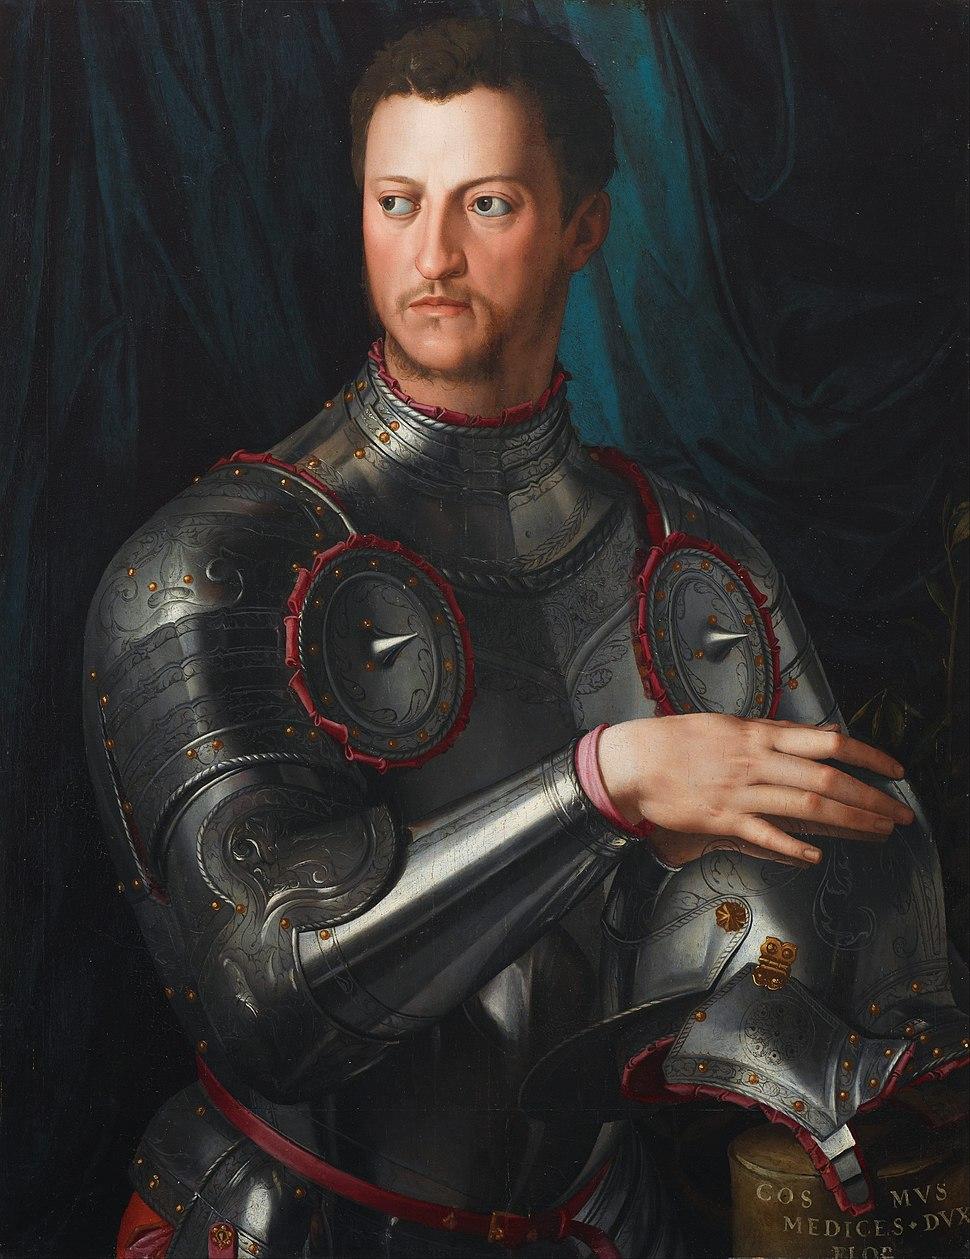 Agnolo Bronzino - Cosimo I de' Medici in armour - Google Art Project